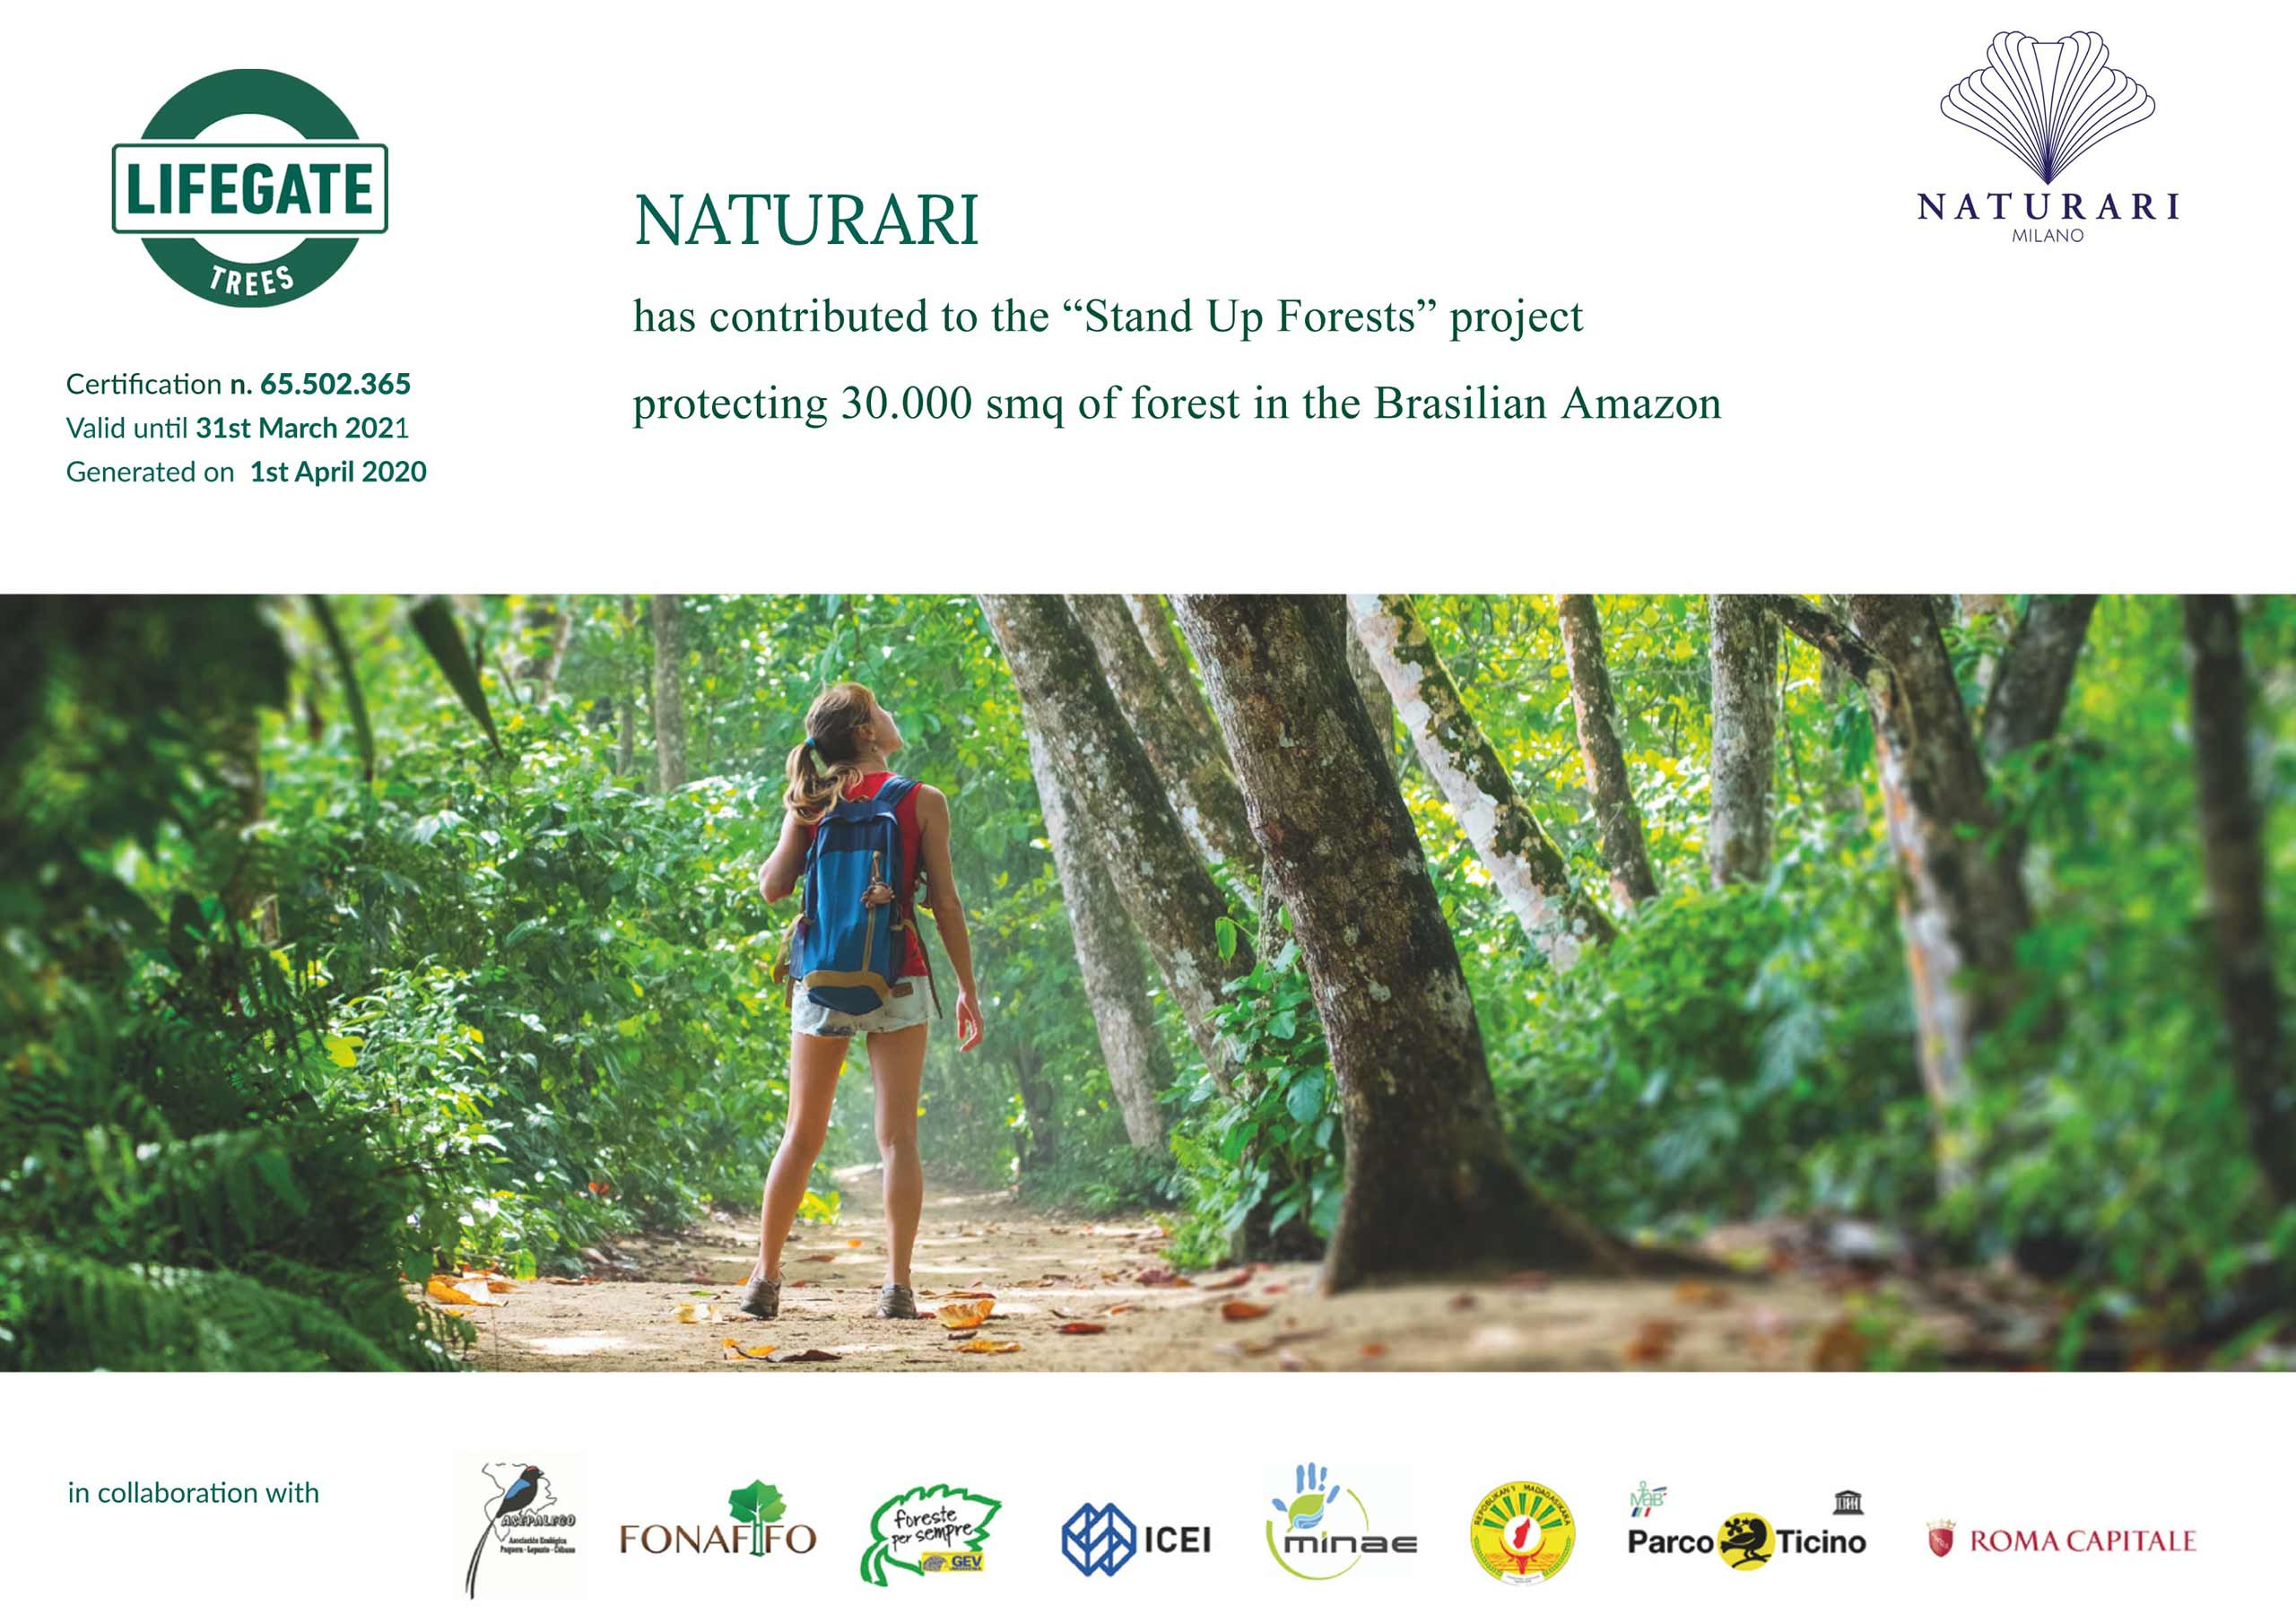 Naturari for enviroment